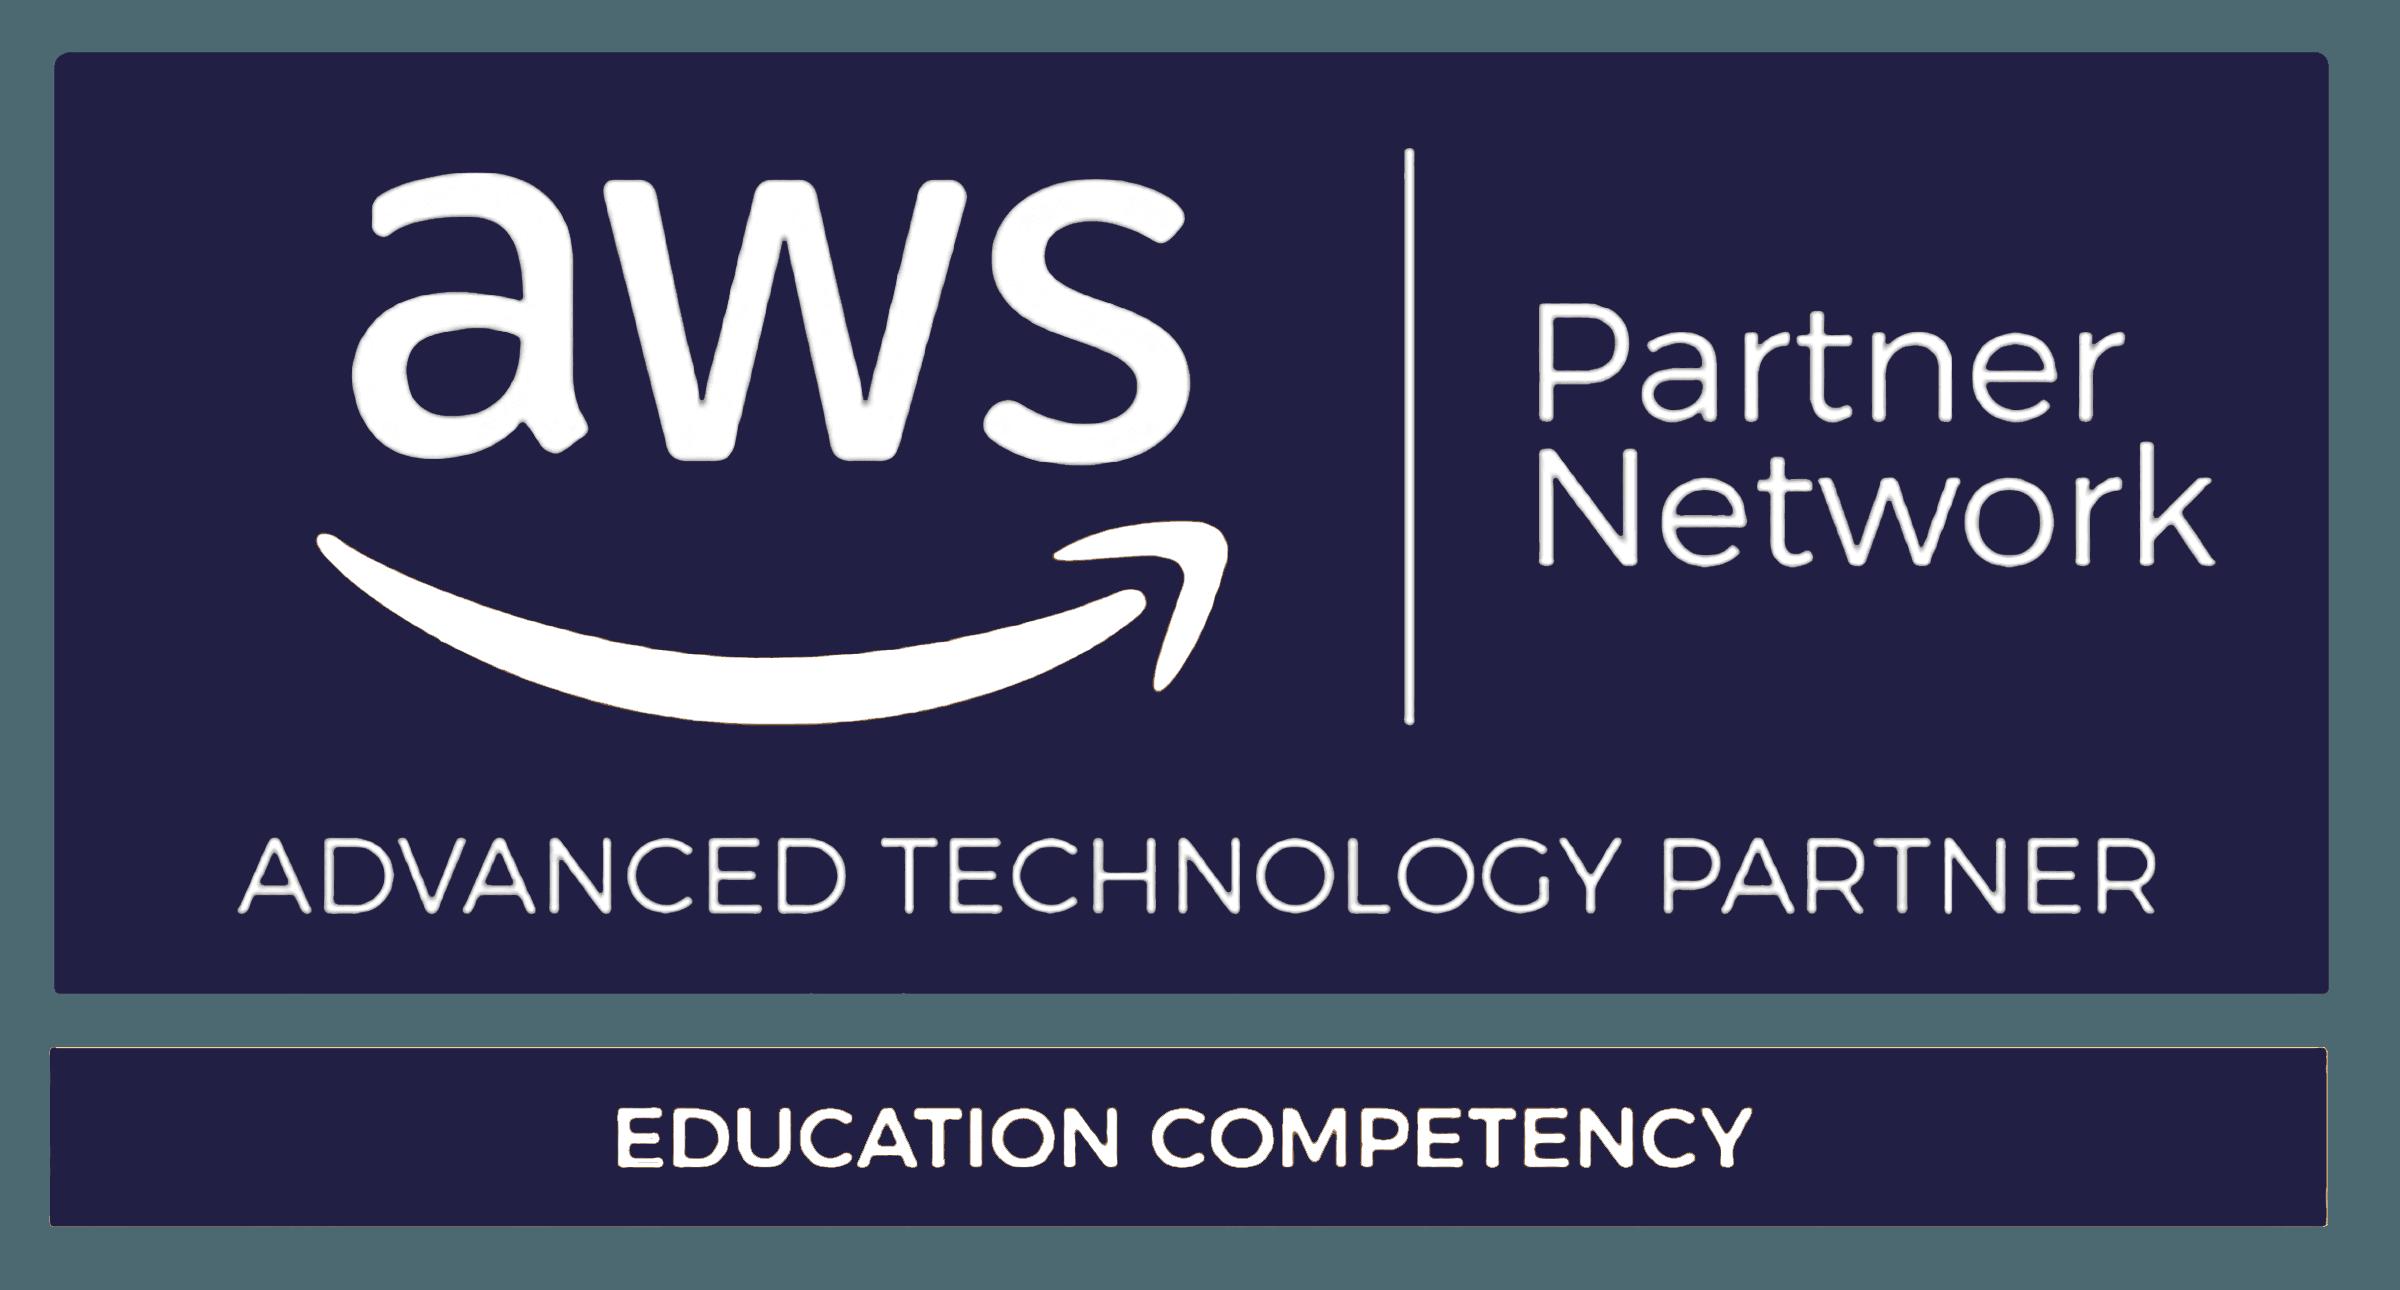 Aws education competency logo dark blue